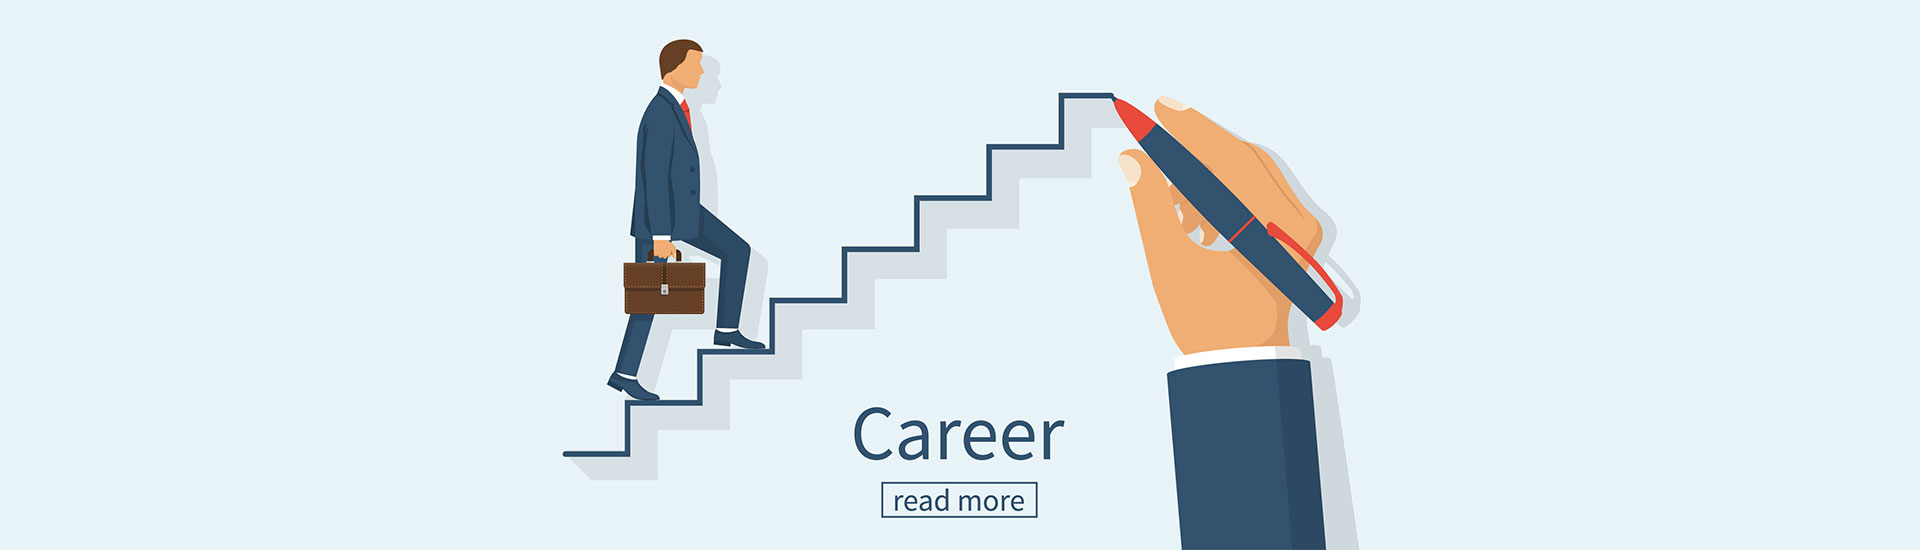 「career development」的圖片搜尋結果